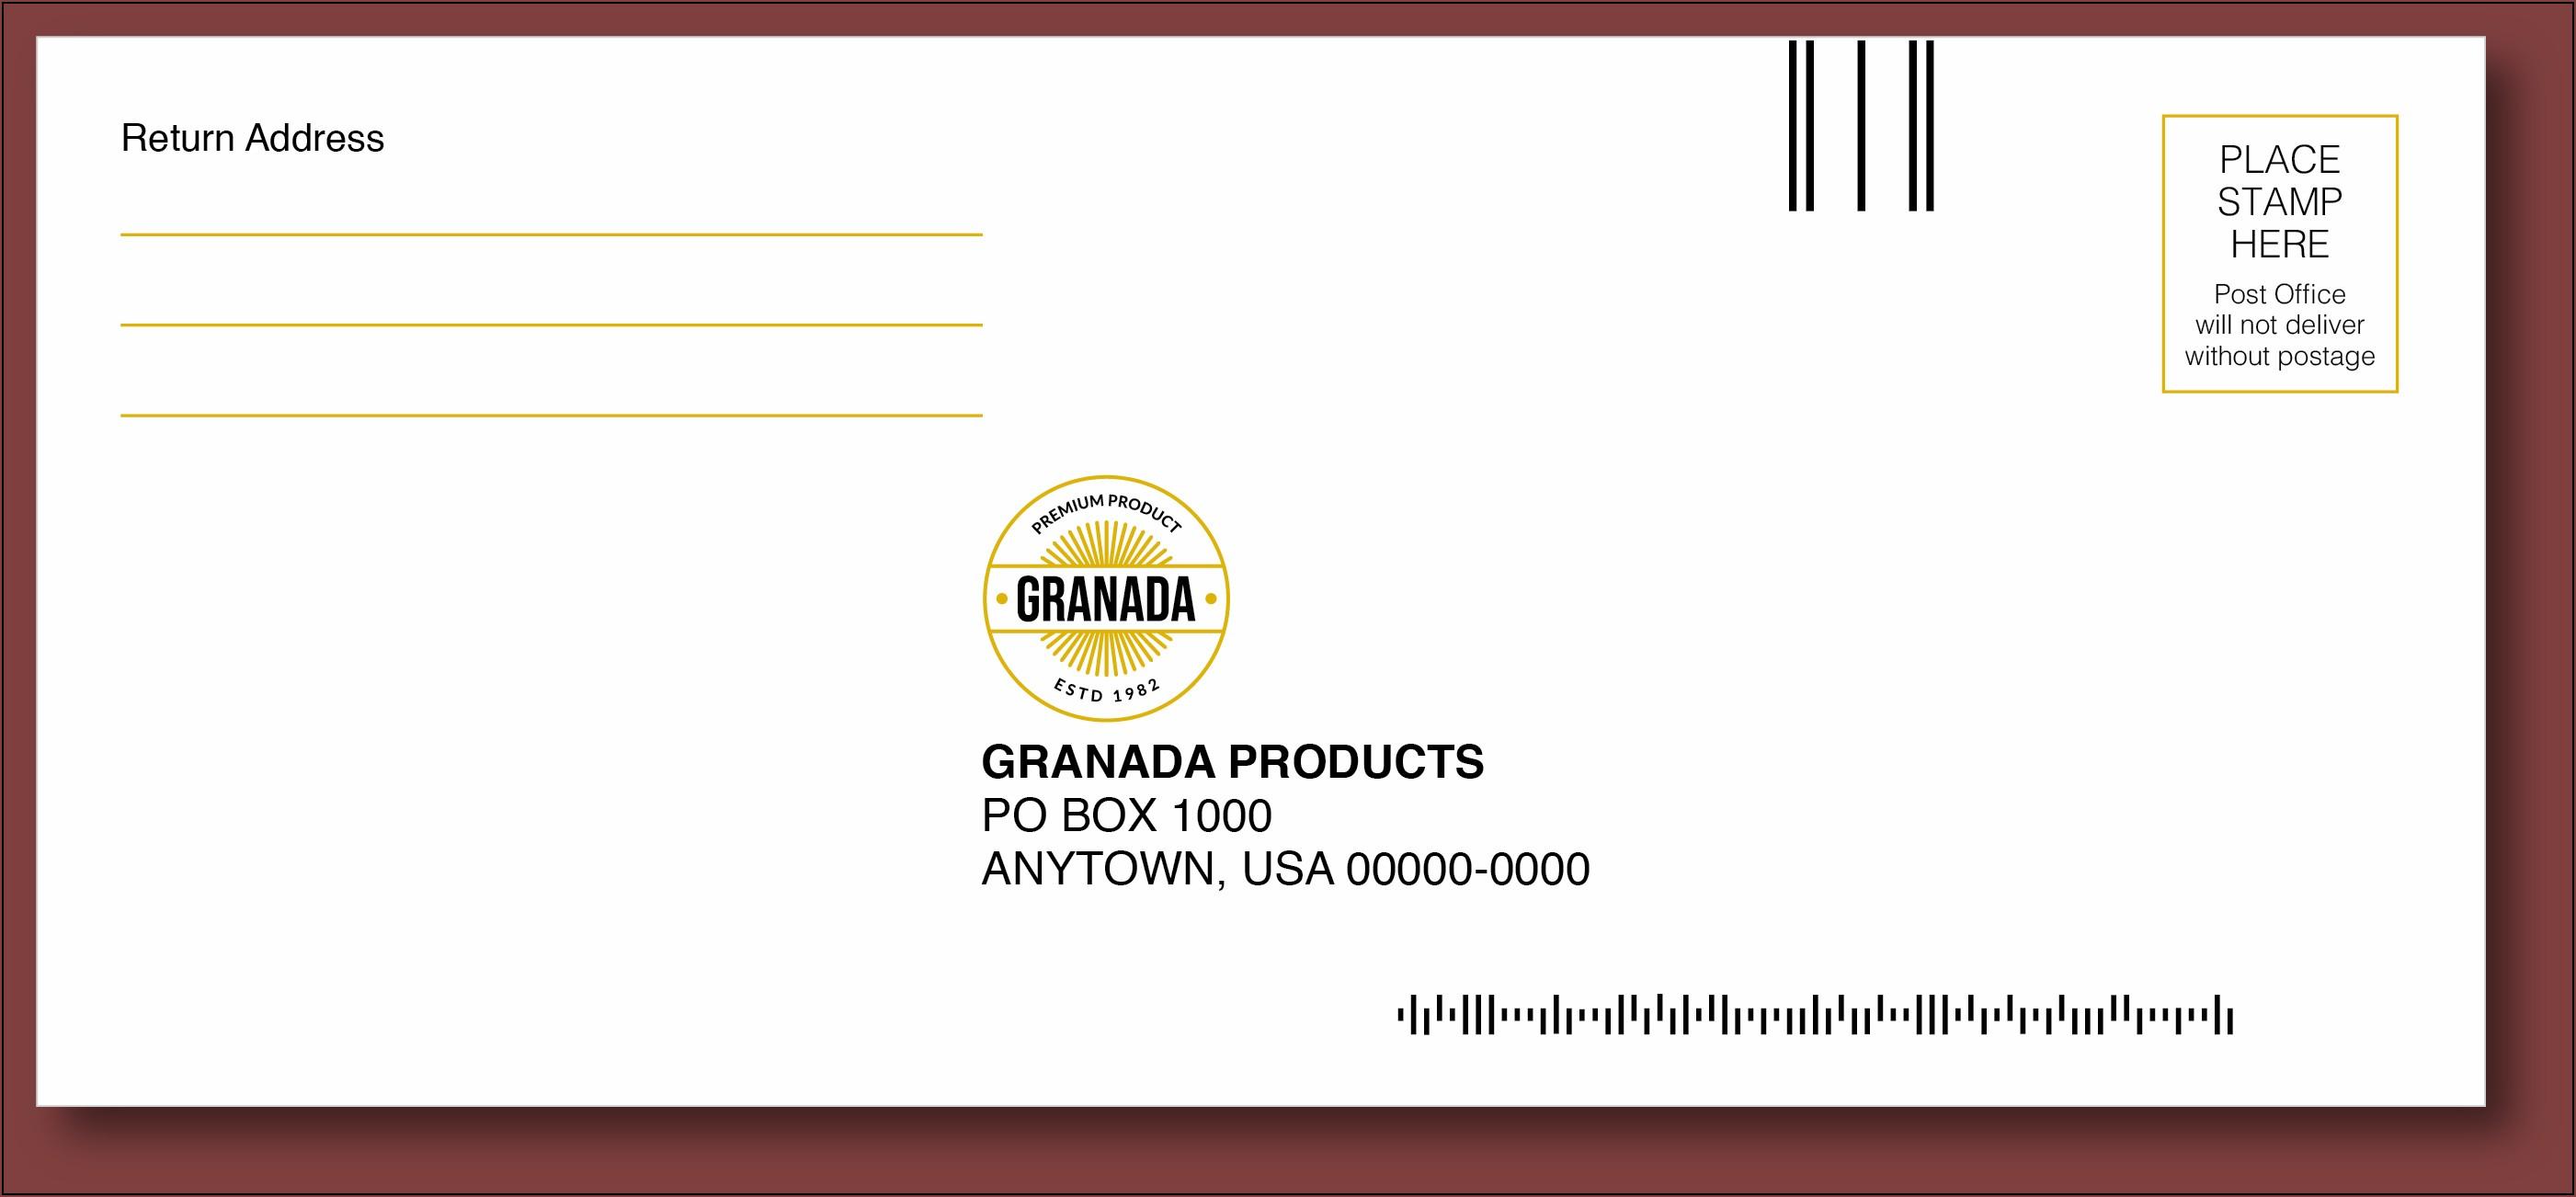 Postage For 6x9 Envelope 2021